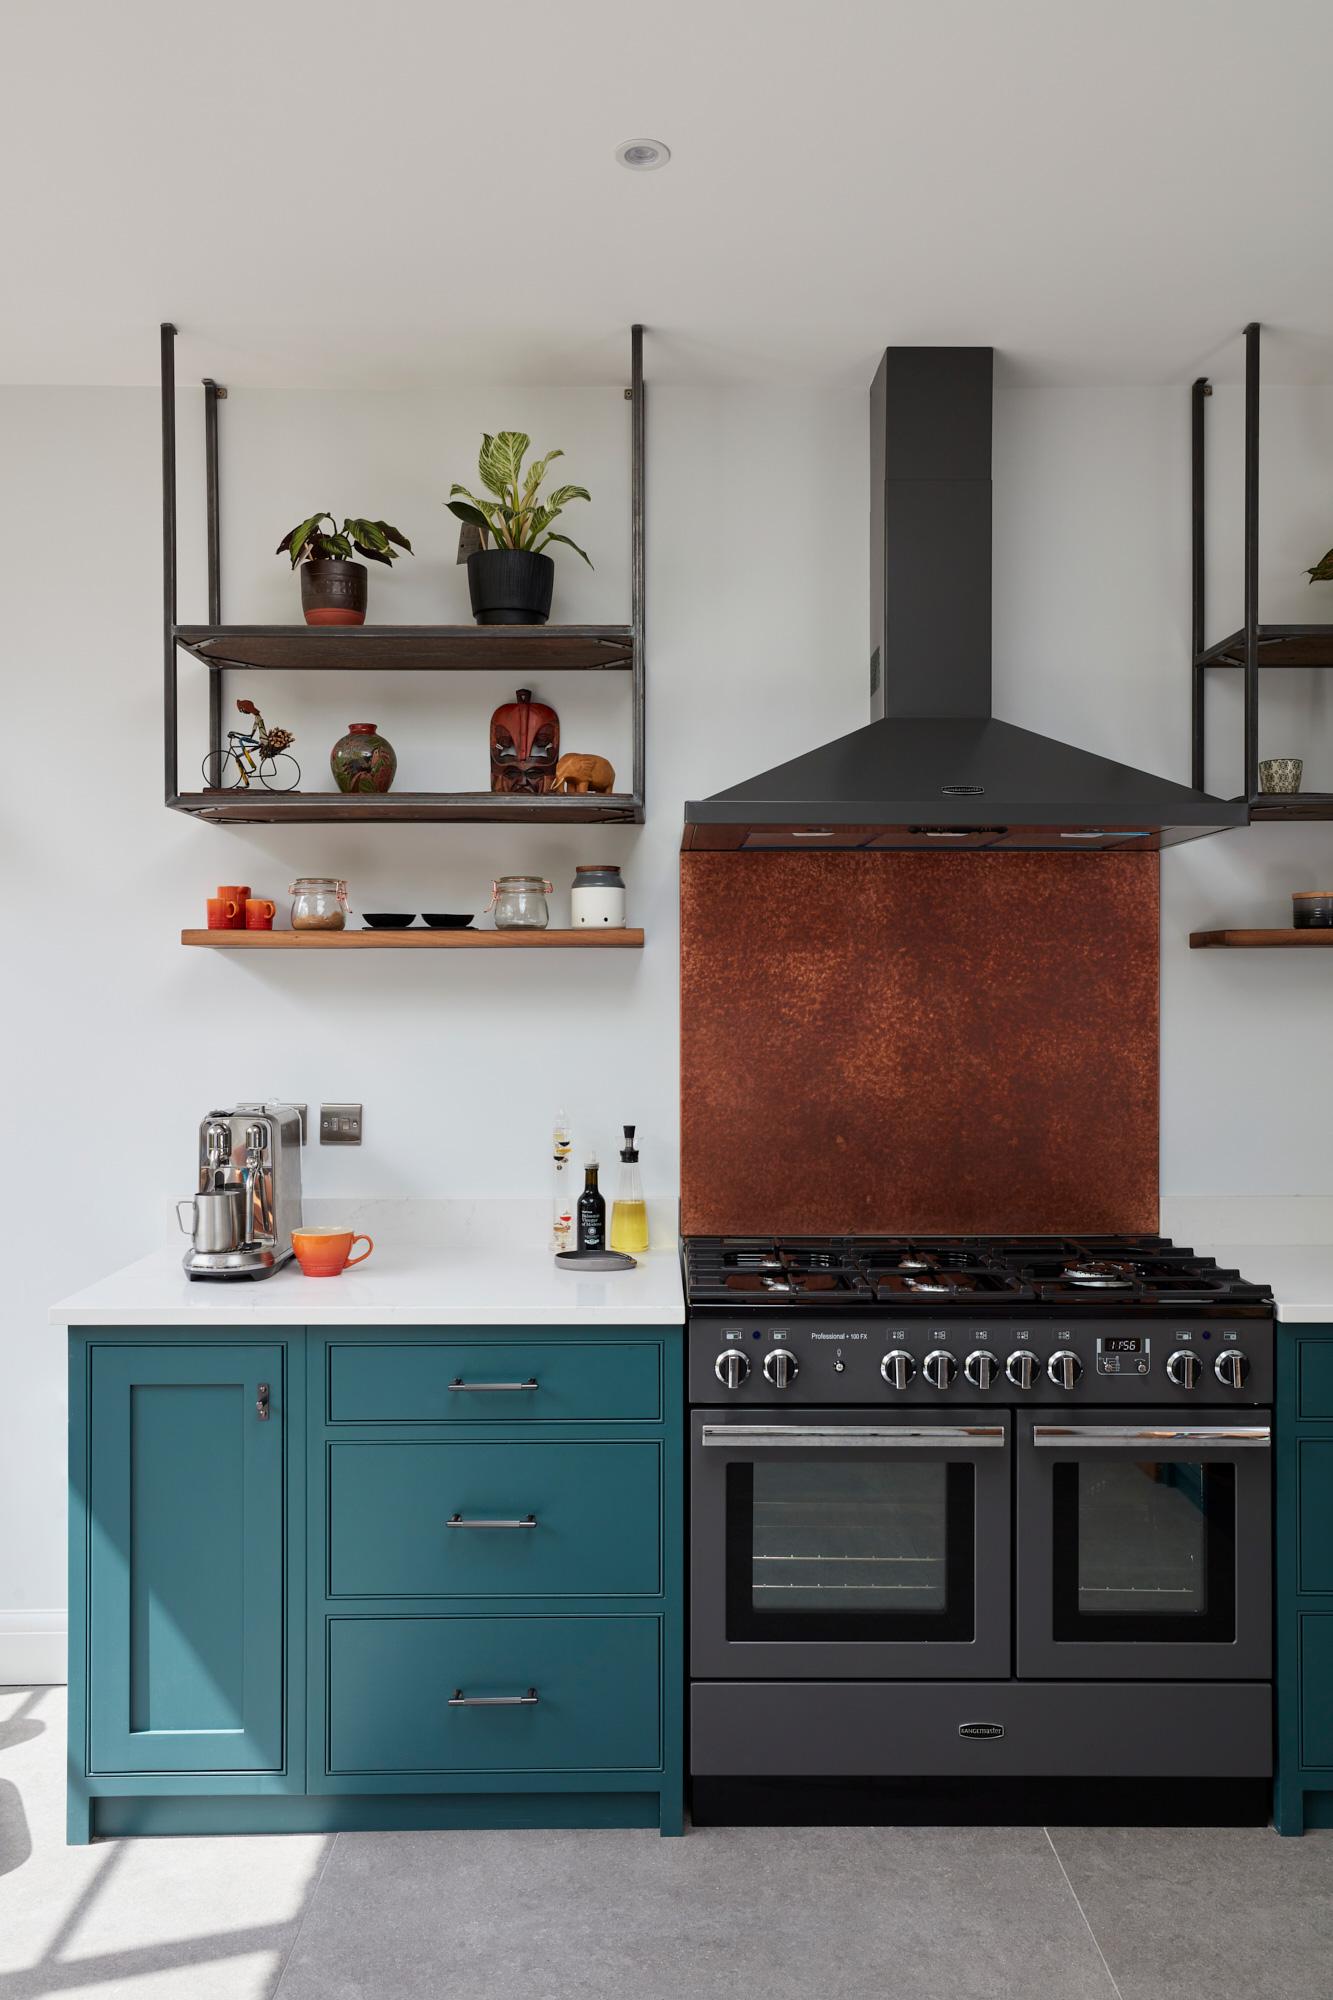 Copper backsplash and open industrial shelves in bespoke painted kitchen